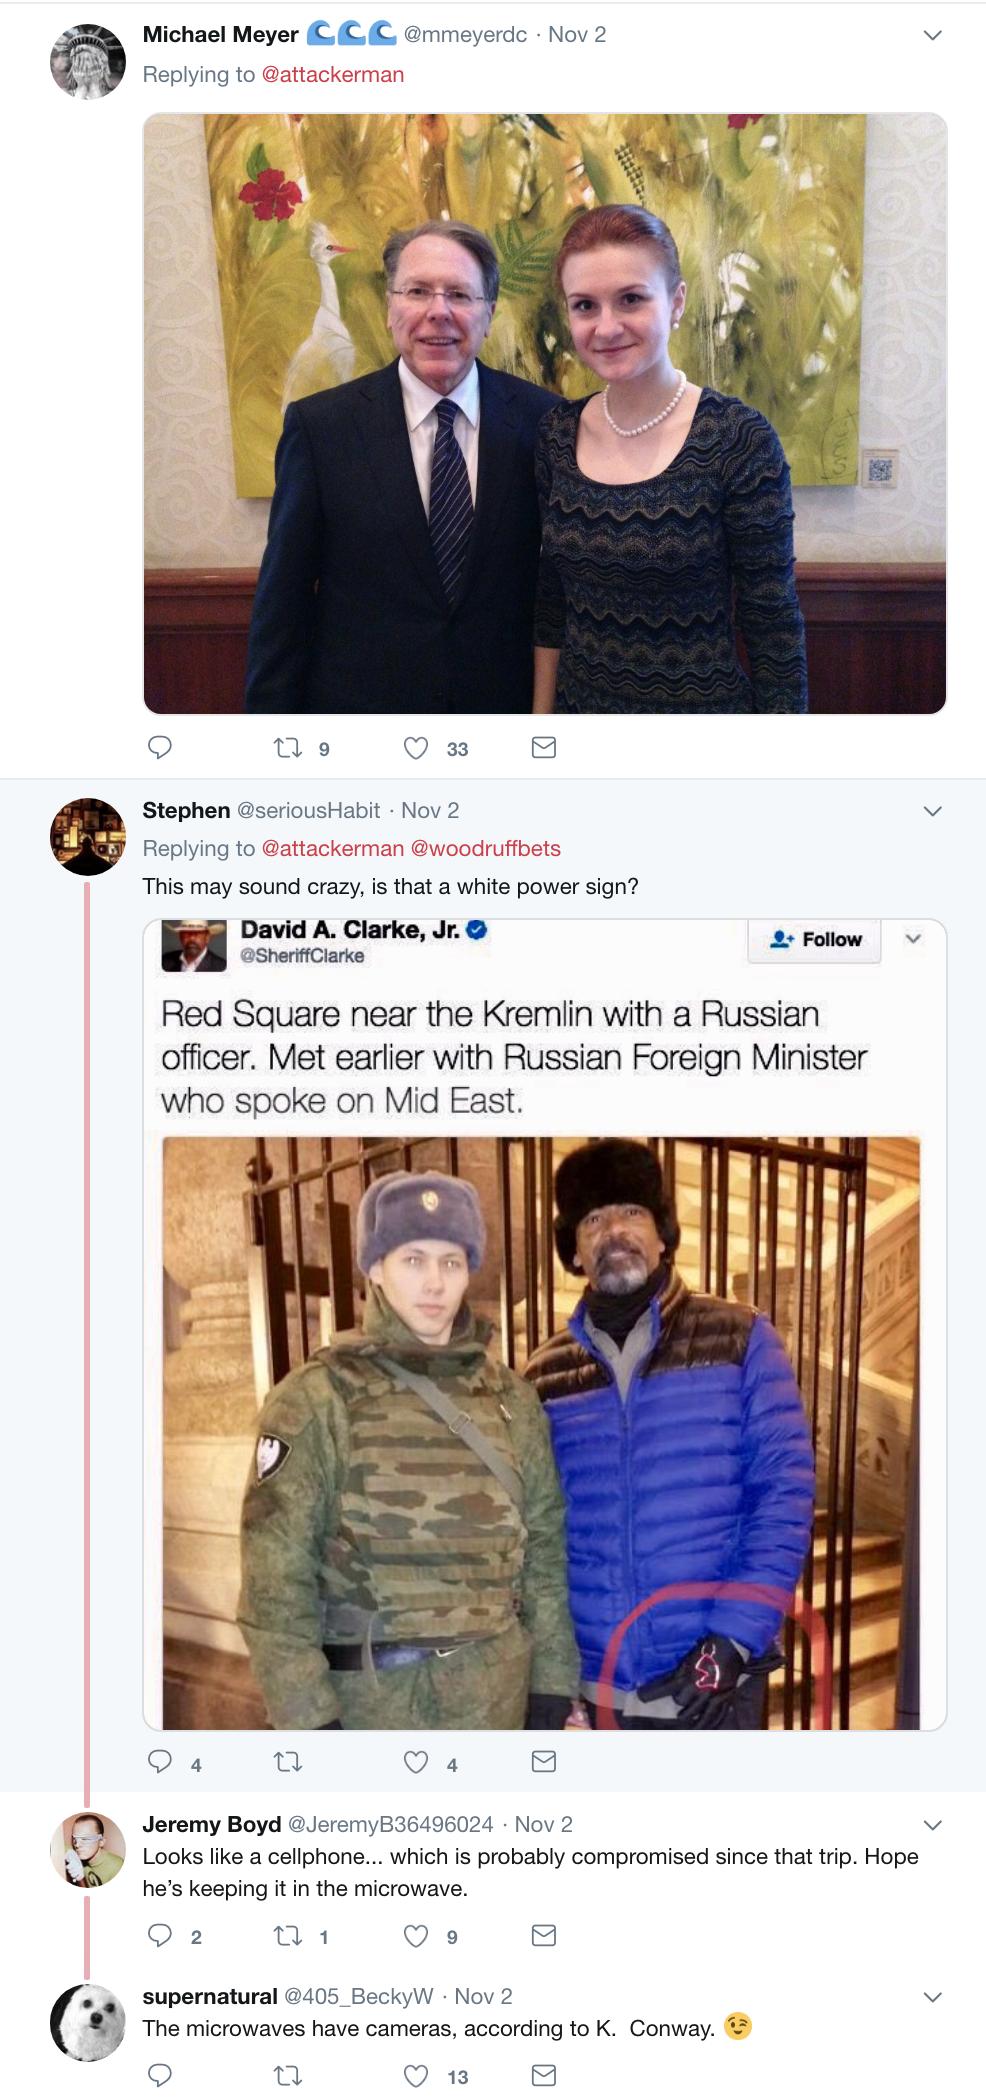 Screen-Shot-2018-11-04-at-6.44.59-PM Senate Intel Committee Makes Pre-Midterm Russian Election Meddling Announcement Corruption Crime Gun Control Politics Top Stories